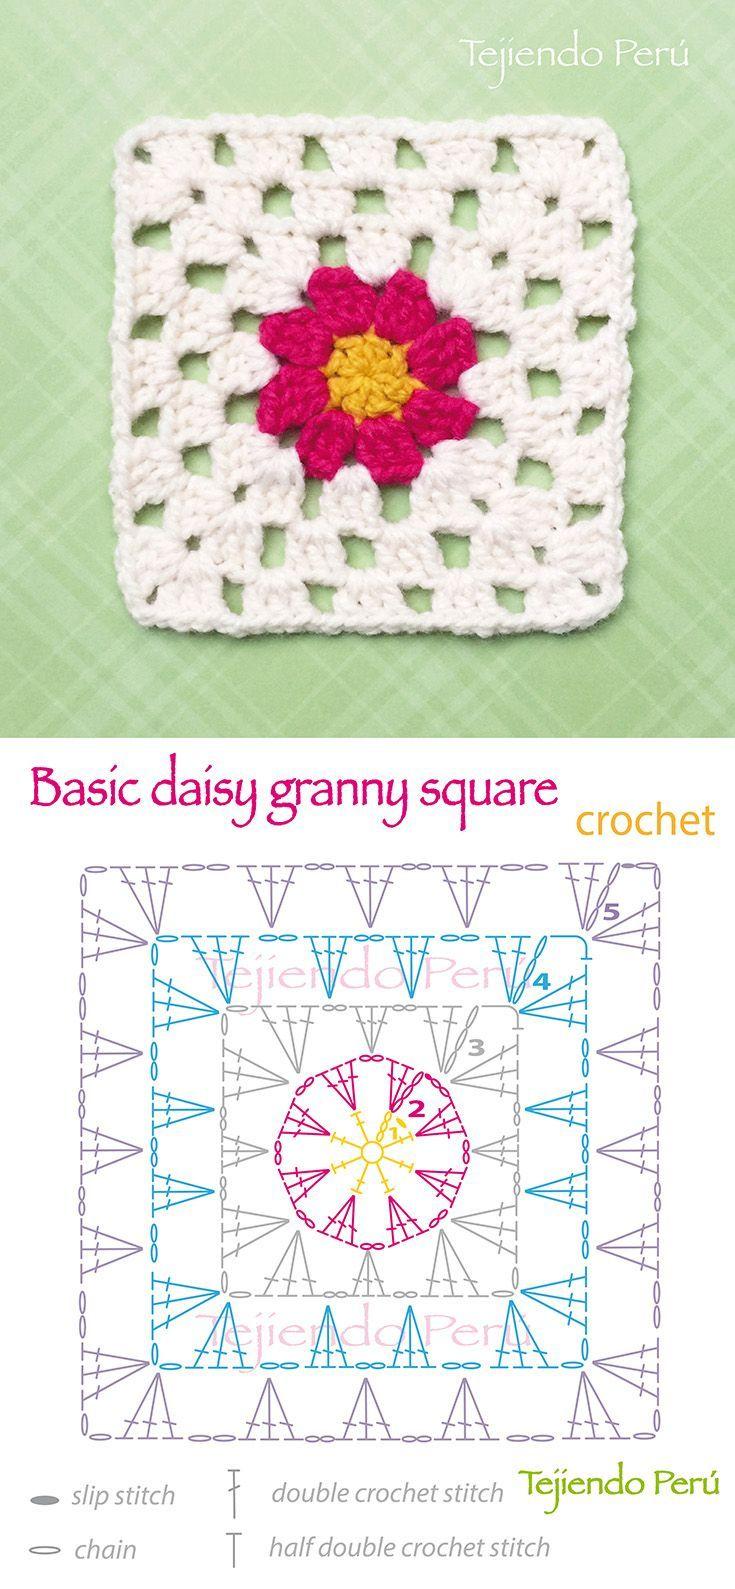 Crochet basic daisy granny square pattern diagram or chart crochet basic daisy granny square pattern diagram or chart ccuart Choice Image